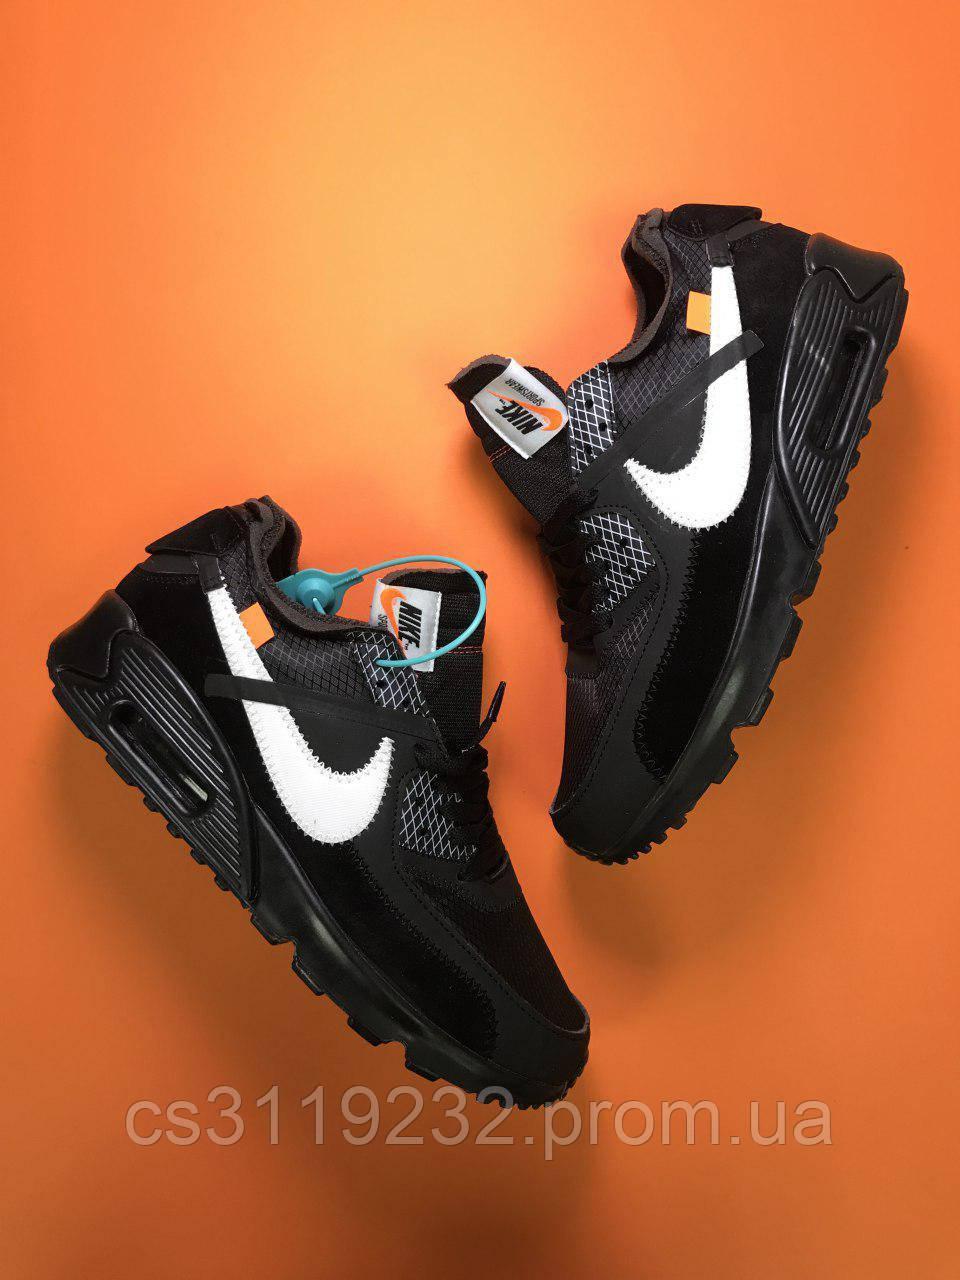 Мужские кроссовки  Nike Air Max 90 OFF-White Black (черные)